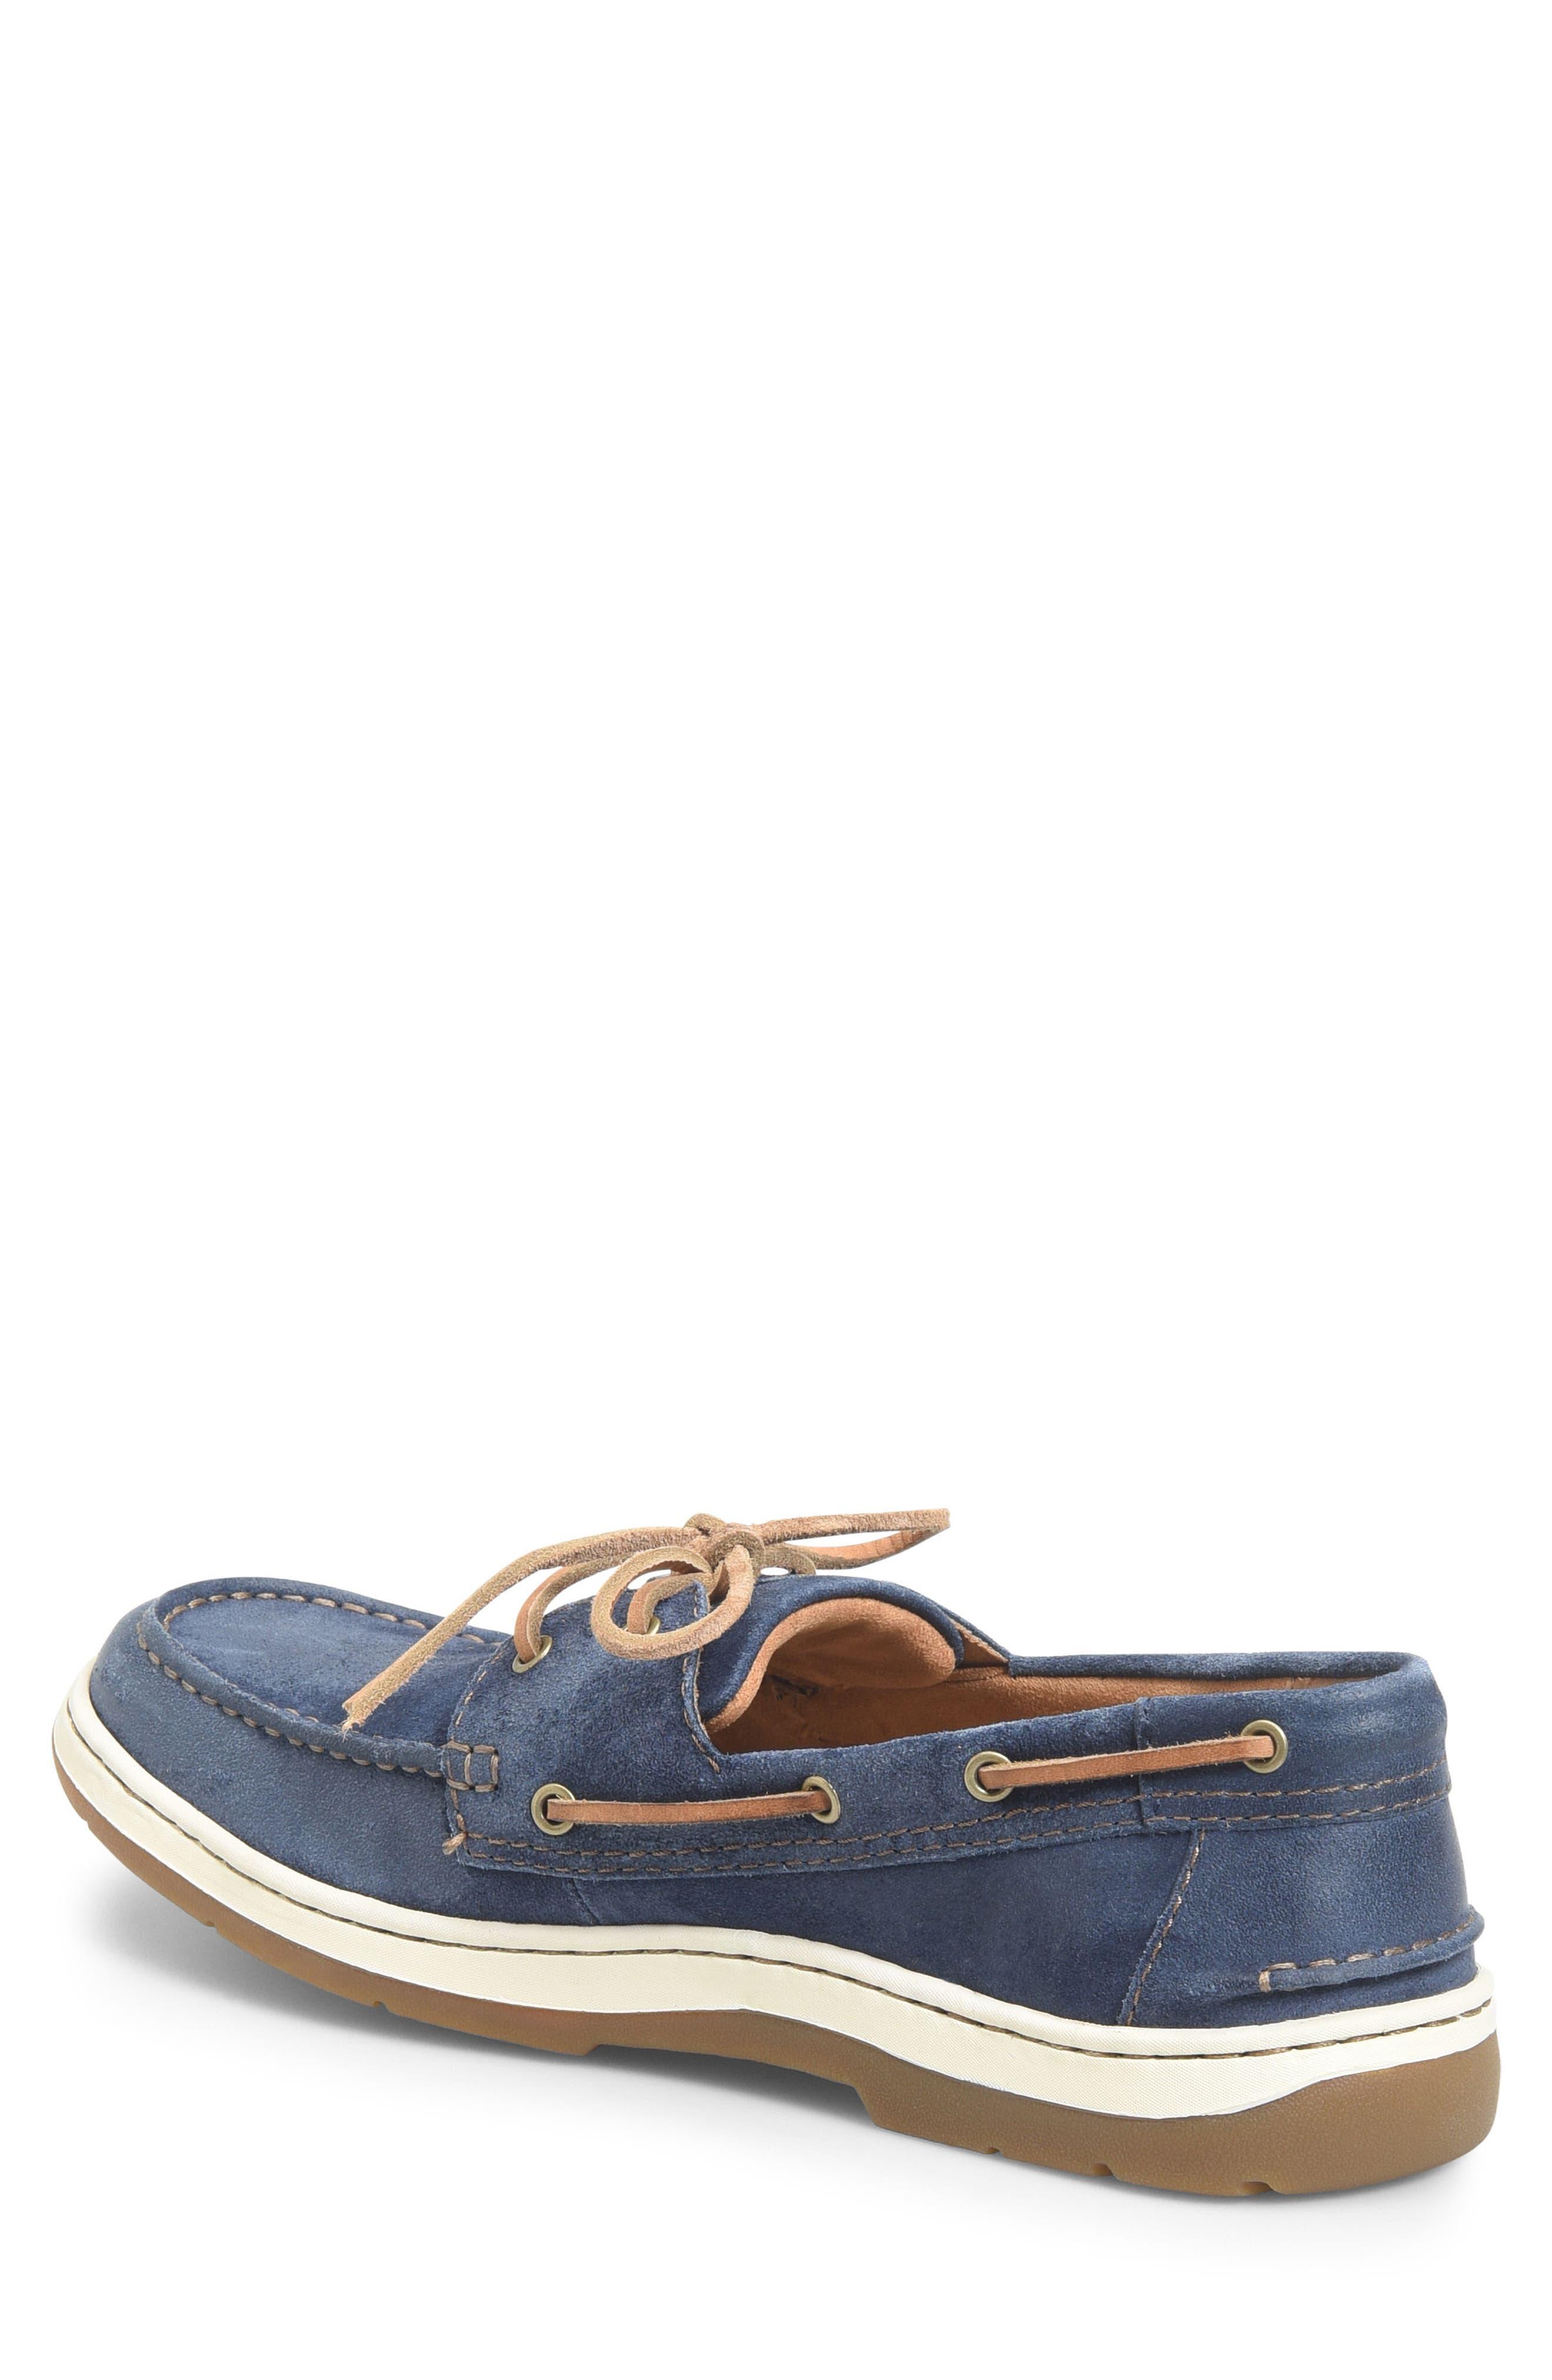 Ocean Boat Shoe,                             Alternate thumbnail 2, color,                             Dark Blue Leather